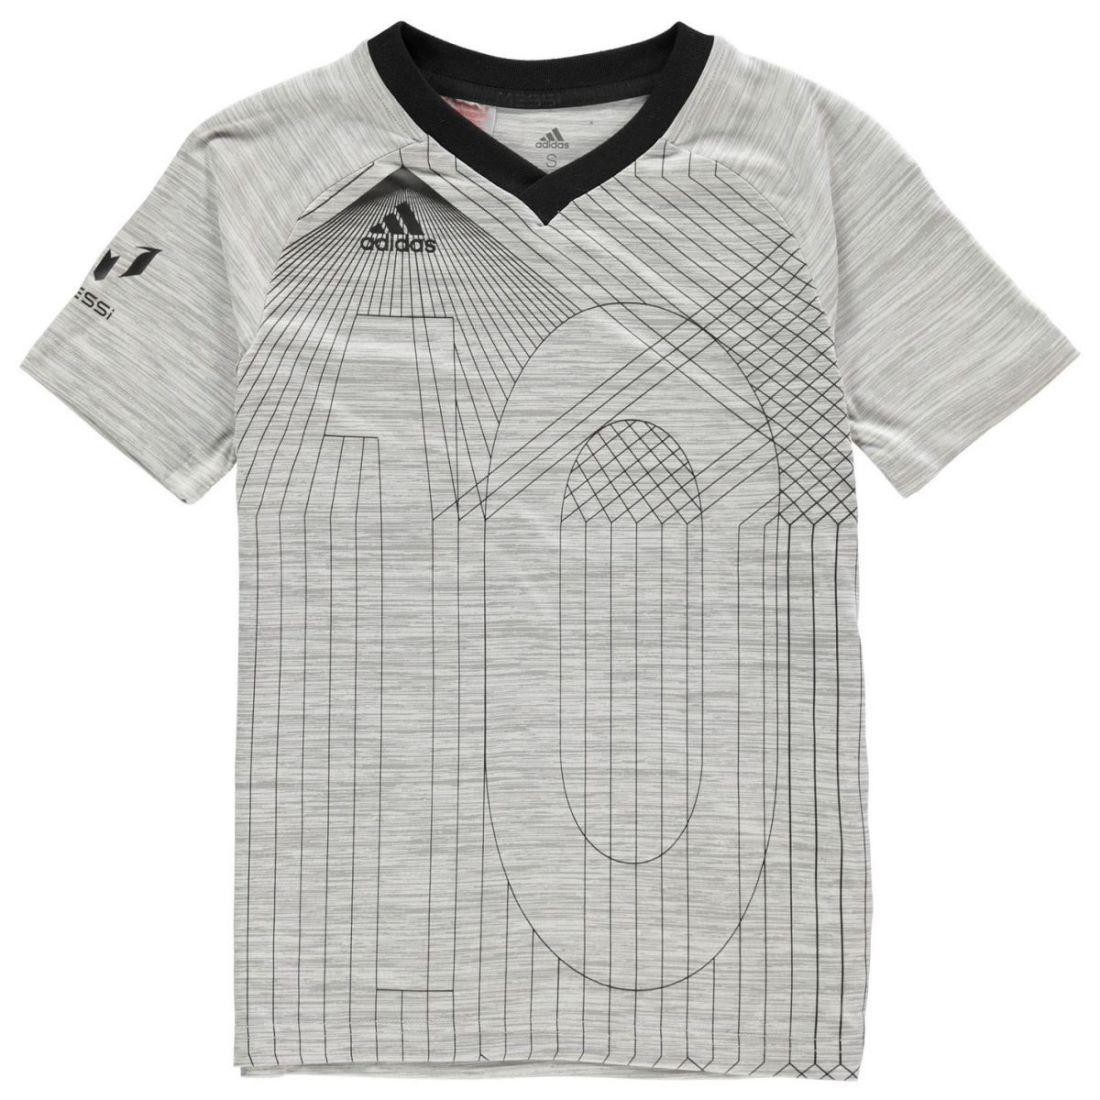 59a091b241f adidas Kids Boys Messi Tee Junior Short Sleeve Performance Shirt V Neck